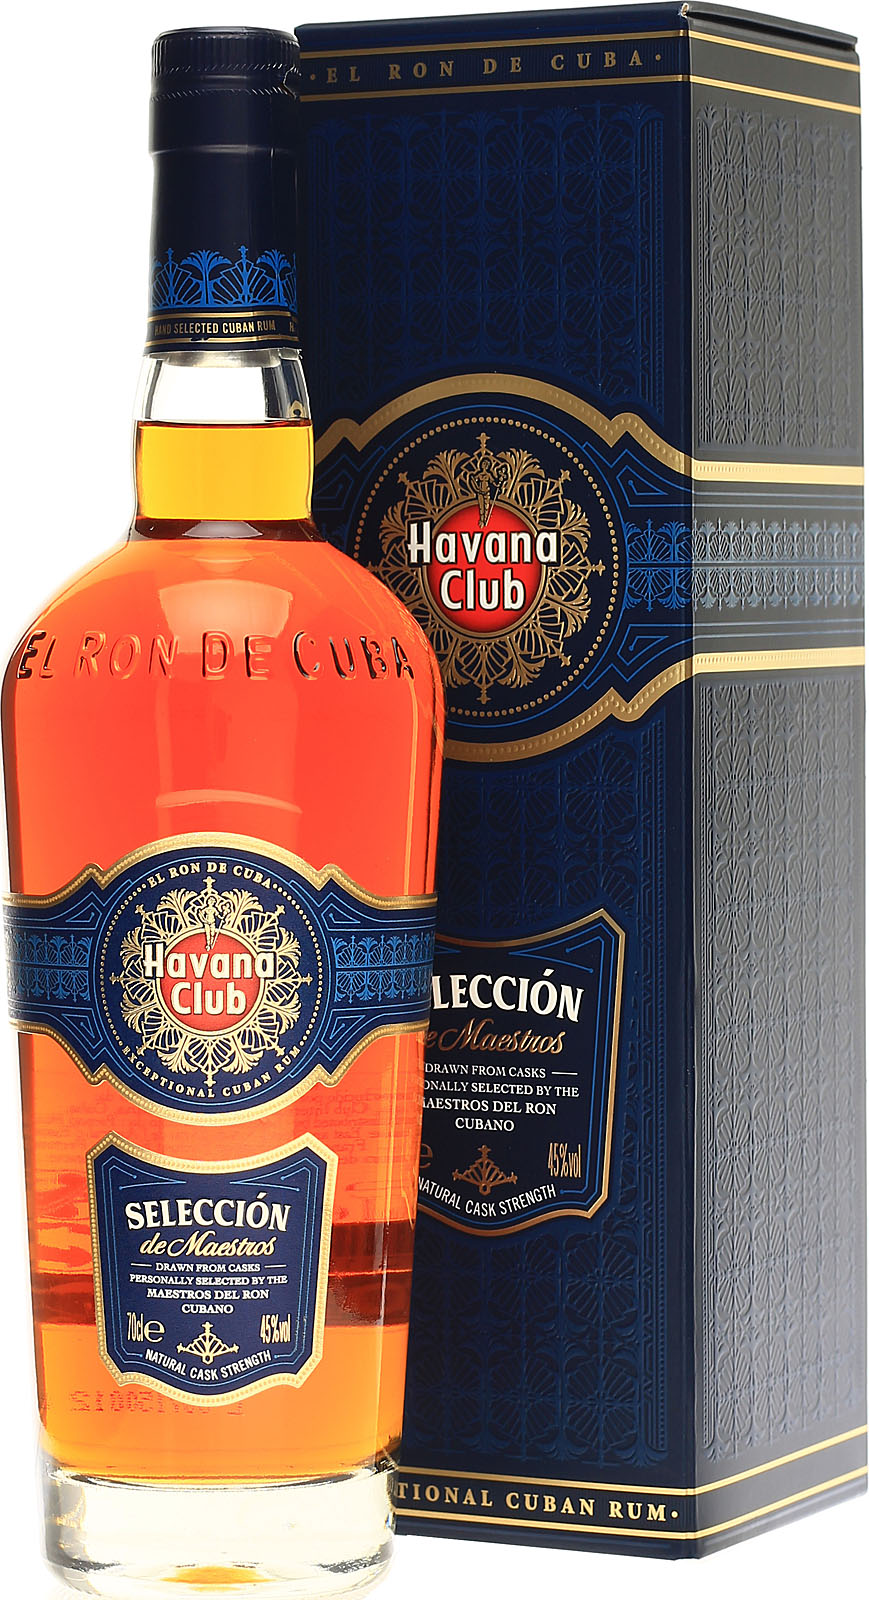 Havana Club Seleccion Maestros Rum aus Kuba hier günstig